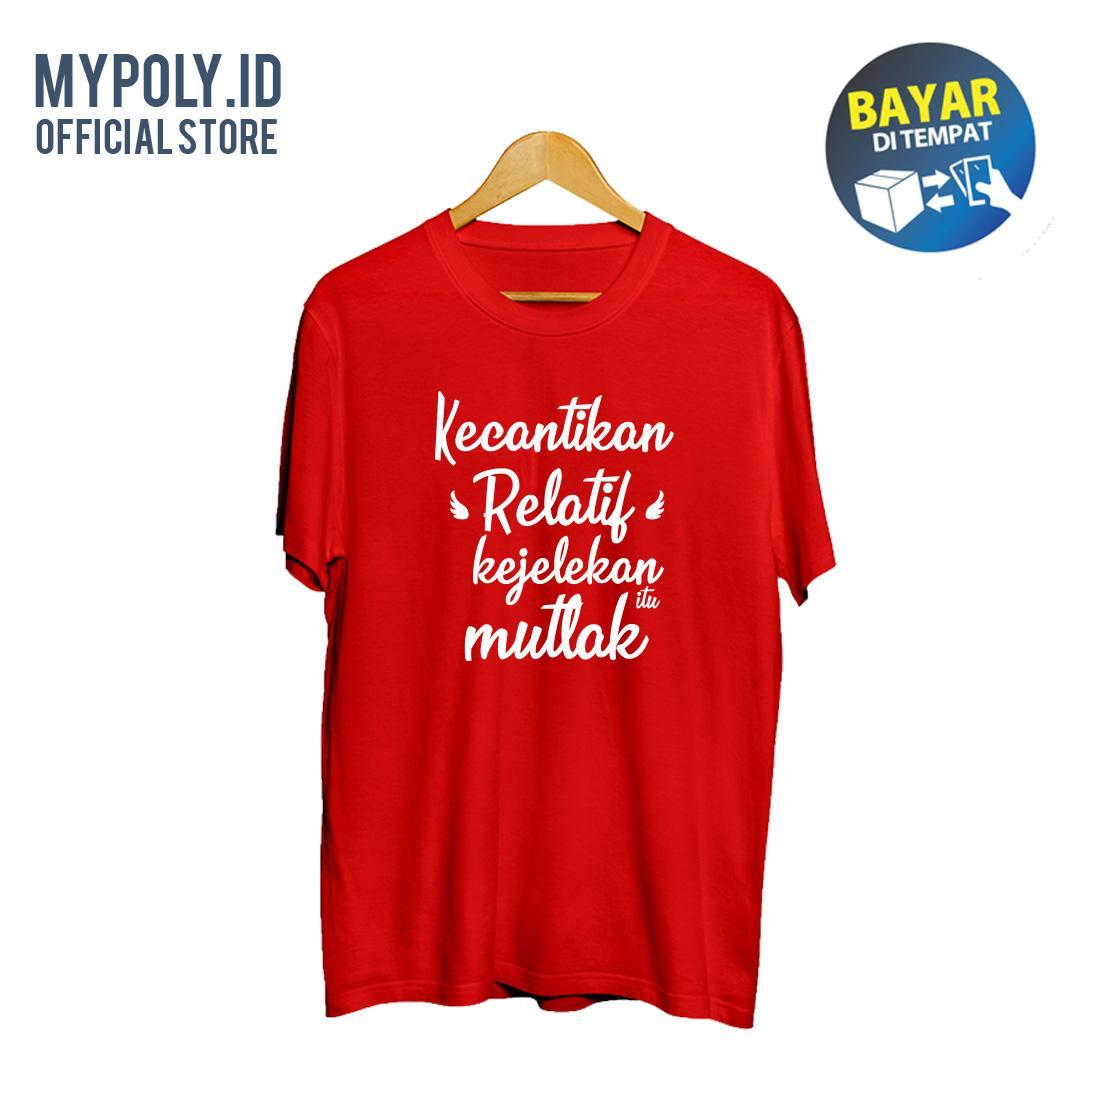 Kaos Premium Mypoly.ID / Baju Distro / Tshirt Casual Pria / Fashion Atasan / Kaos Tumblr Cantik Itu Relatif